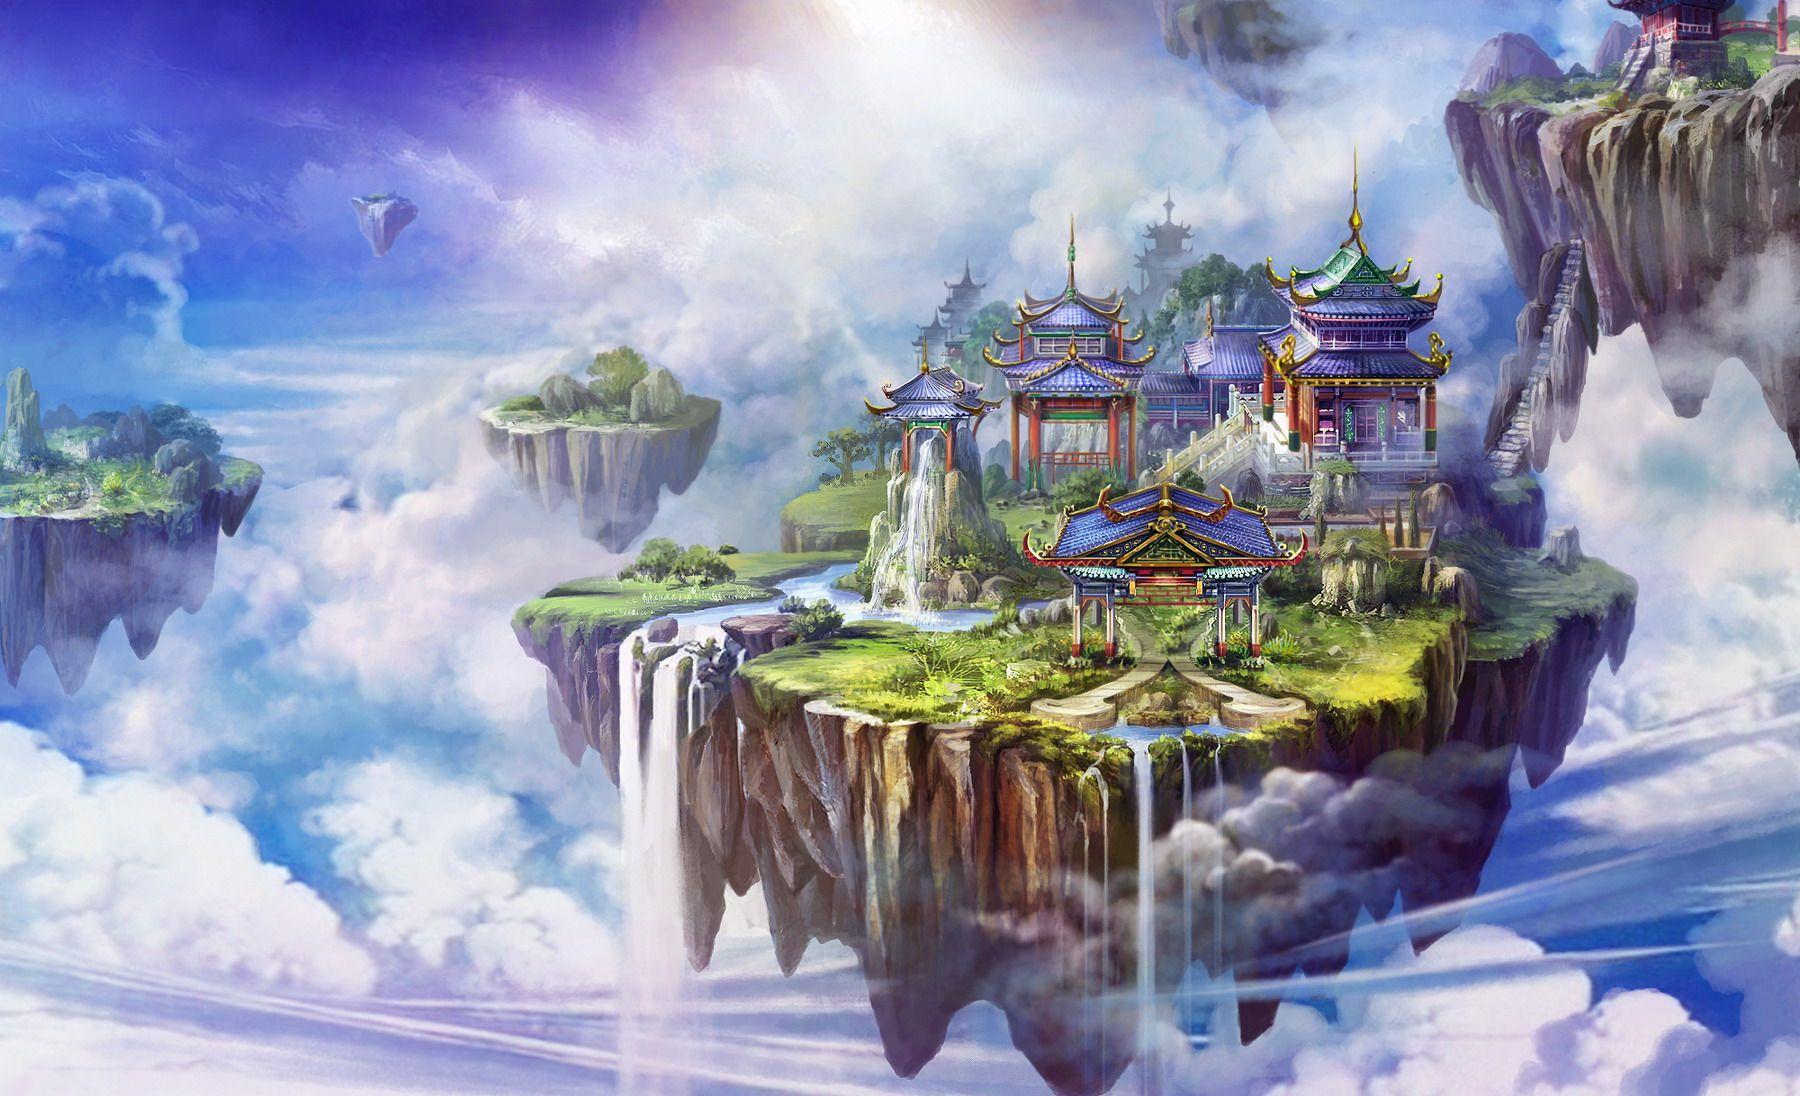 Chinese xianxia fantasy landscape painting fantasy